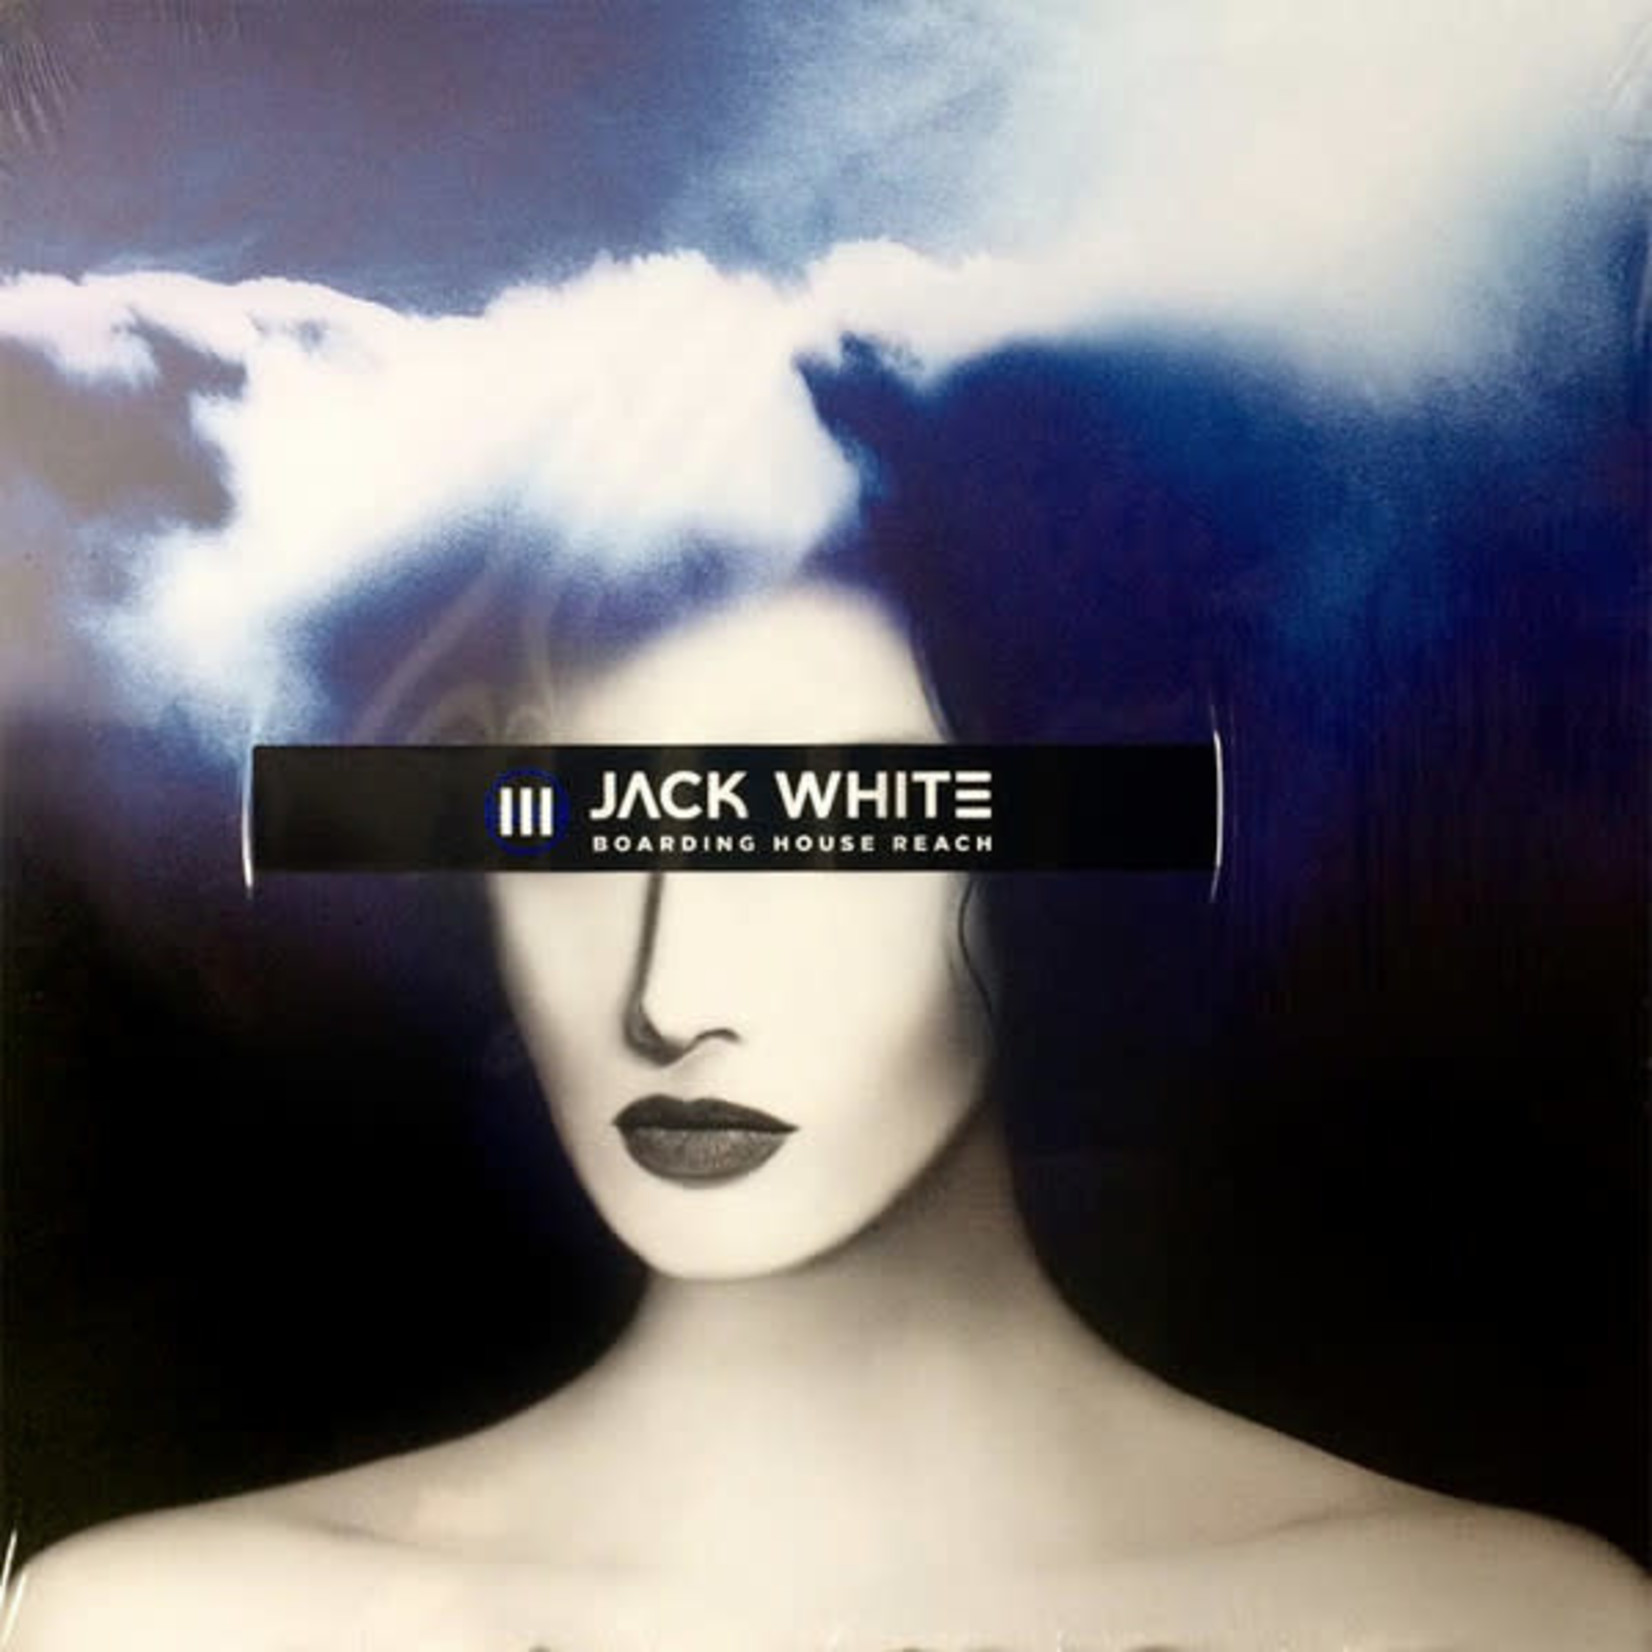 JACK WHITE BOARDING HOUSE REACH